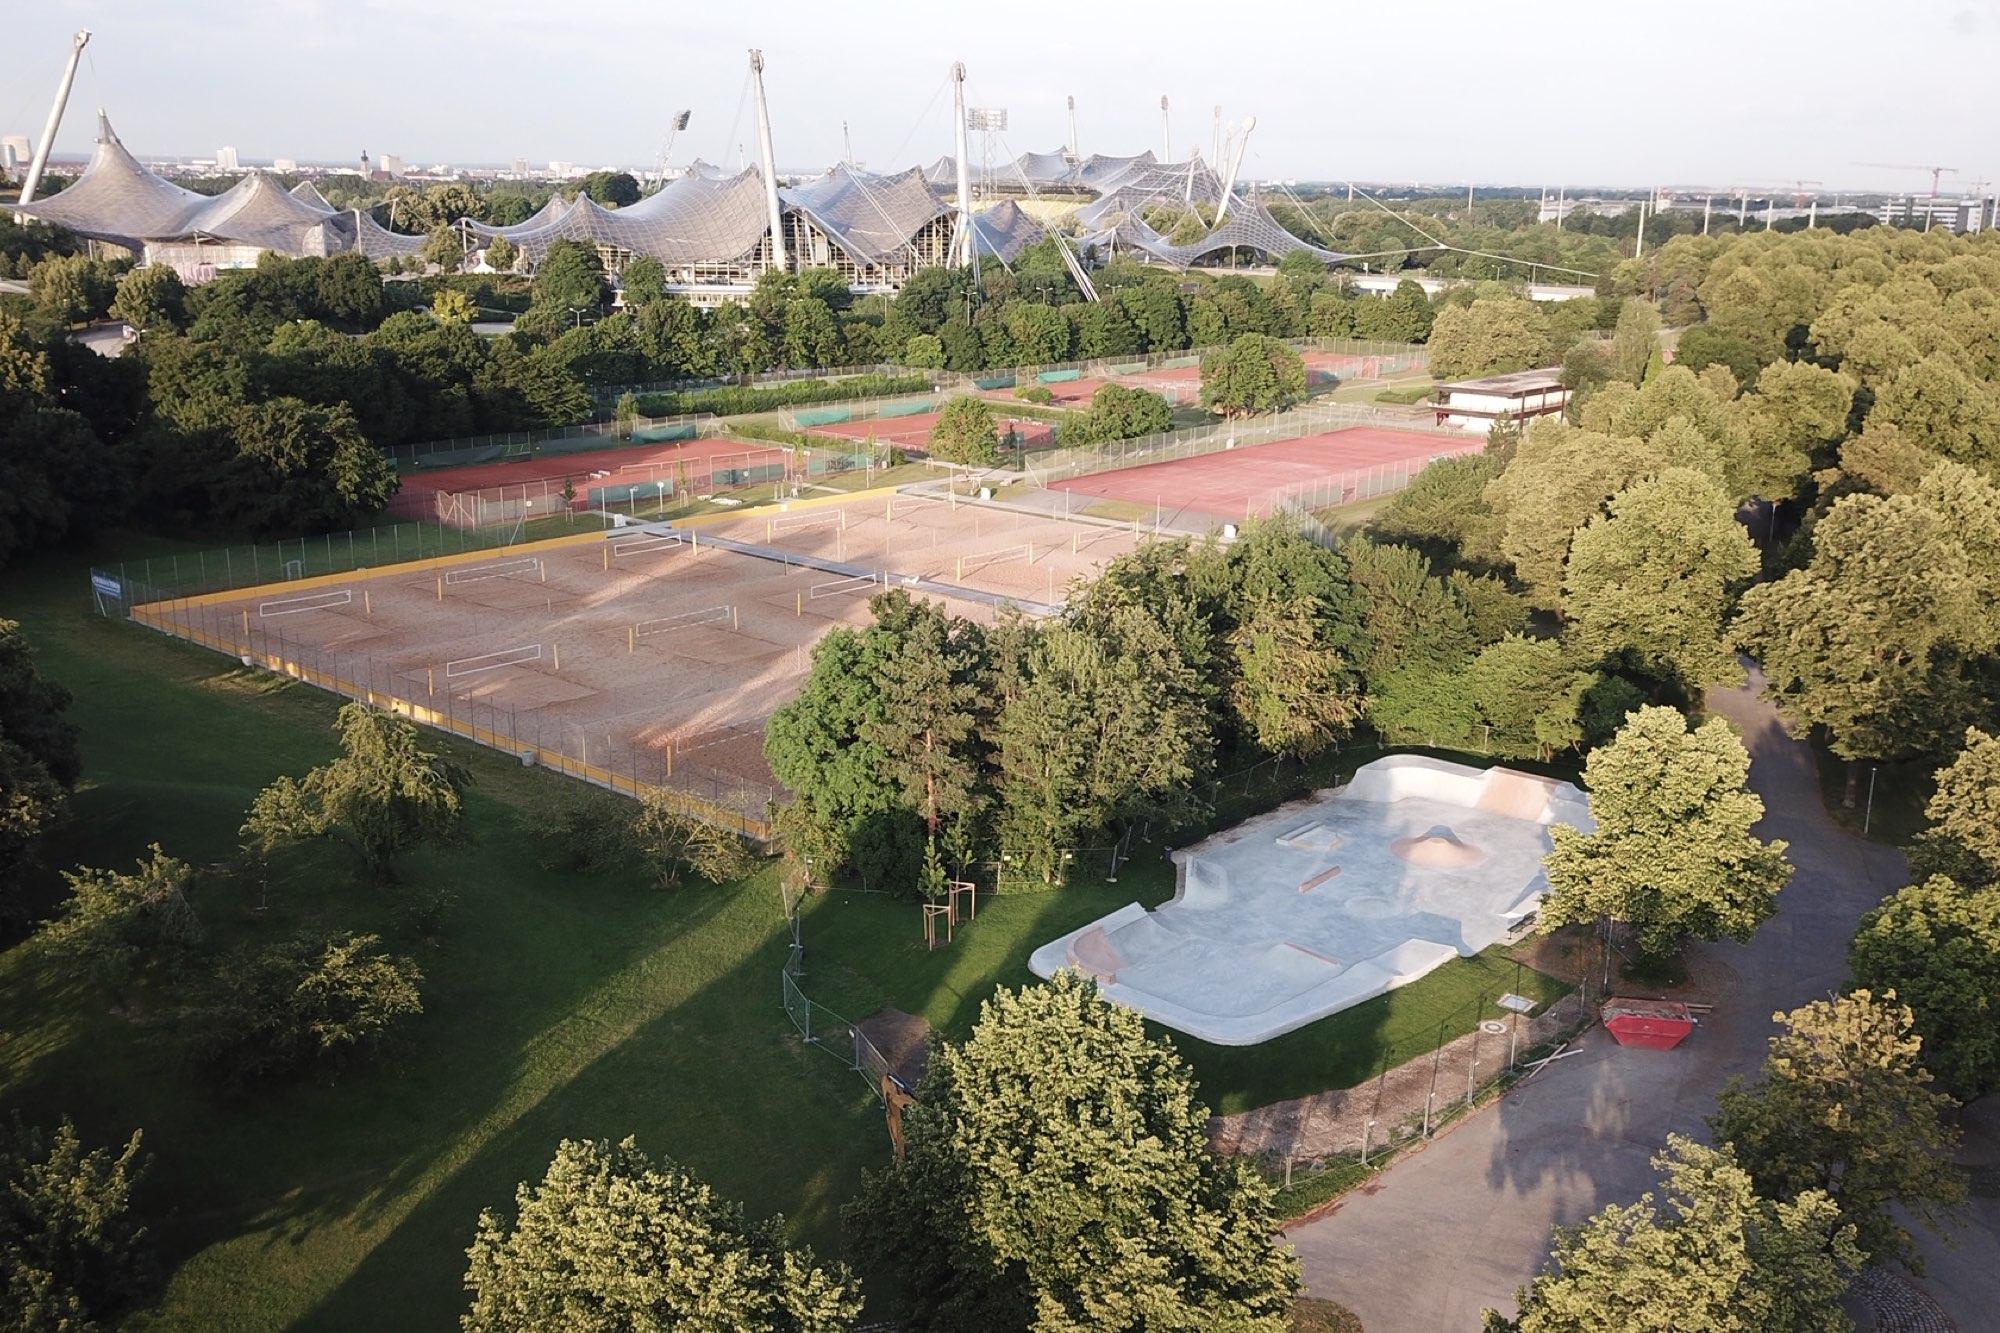 landskate_skatepark_planung_muenchen_stonepark_drone